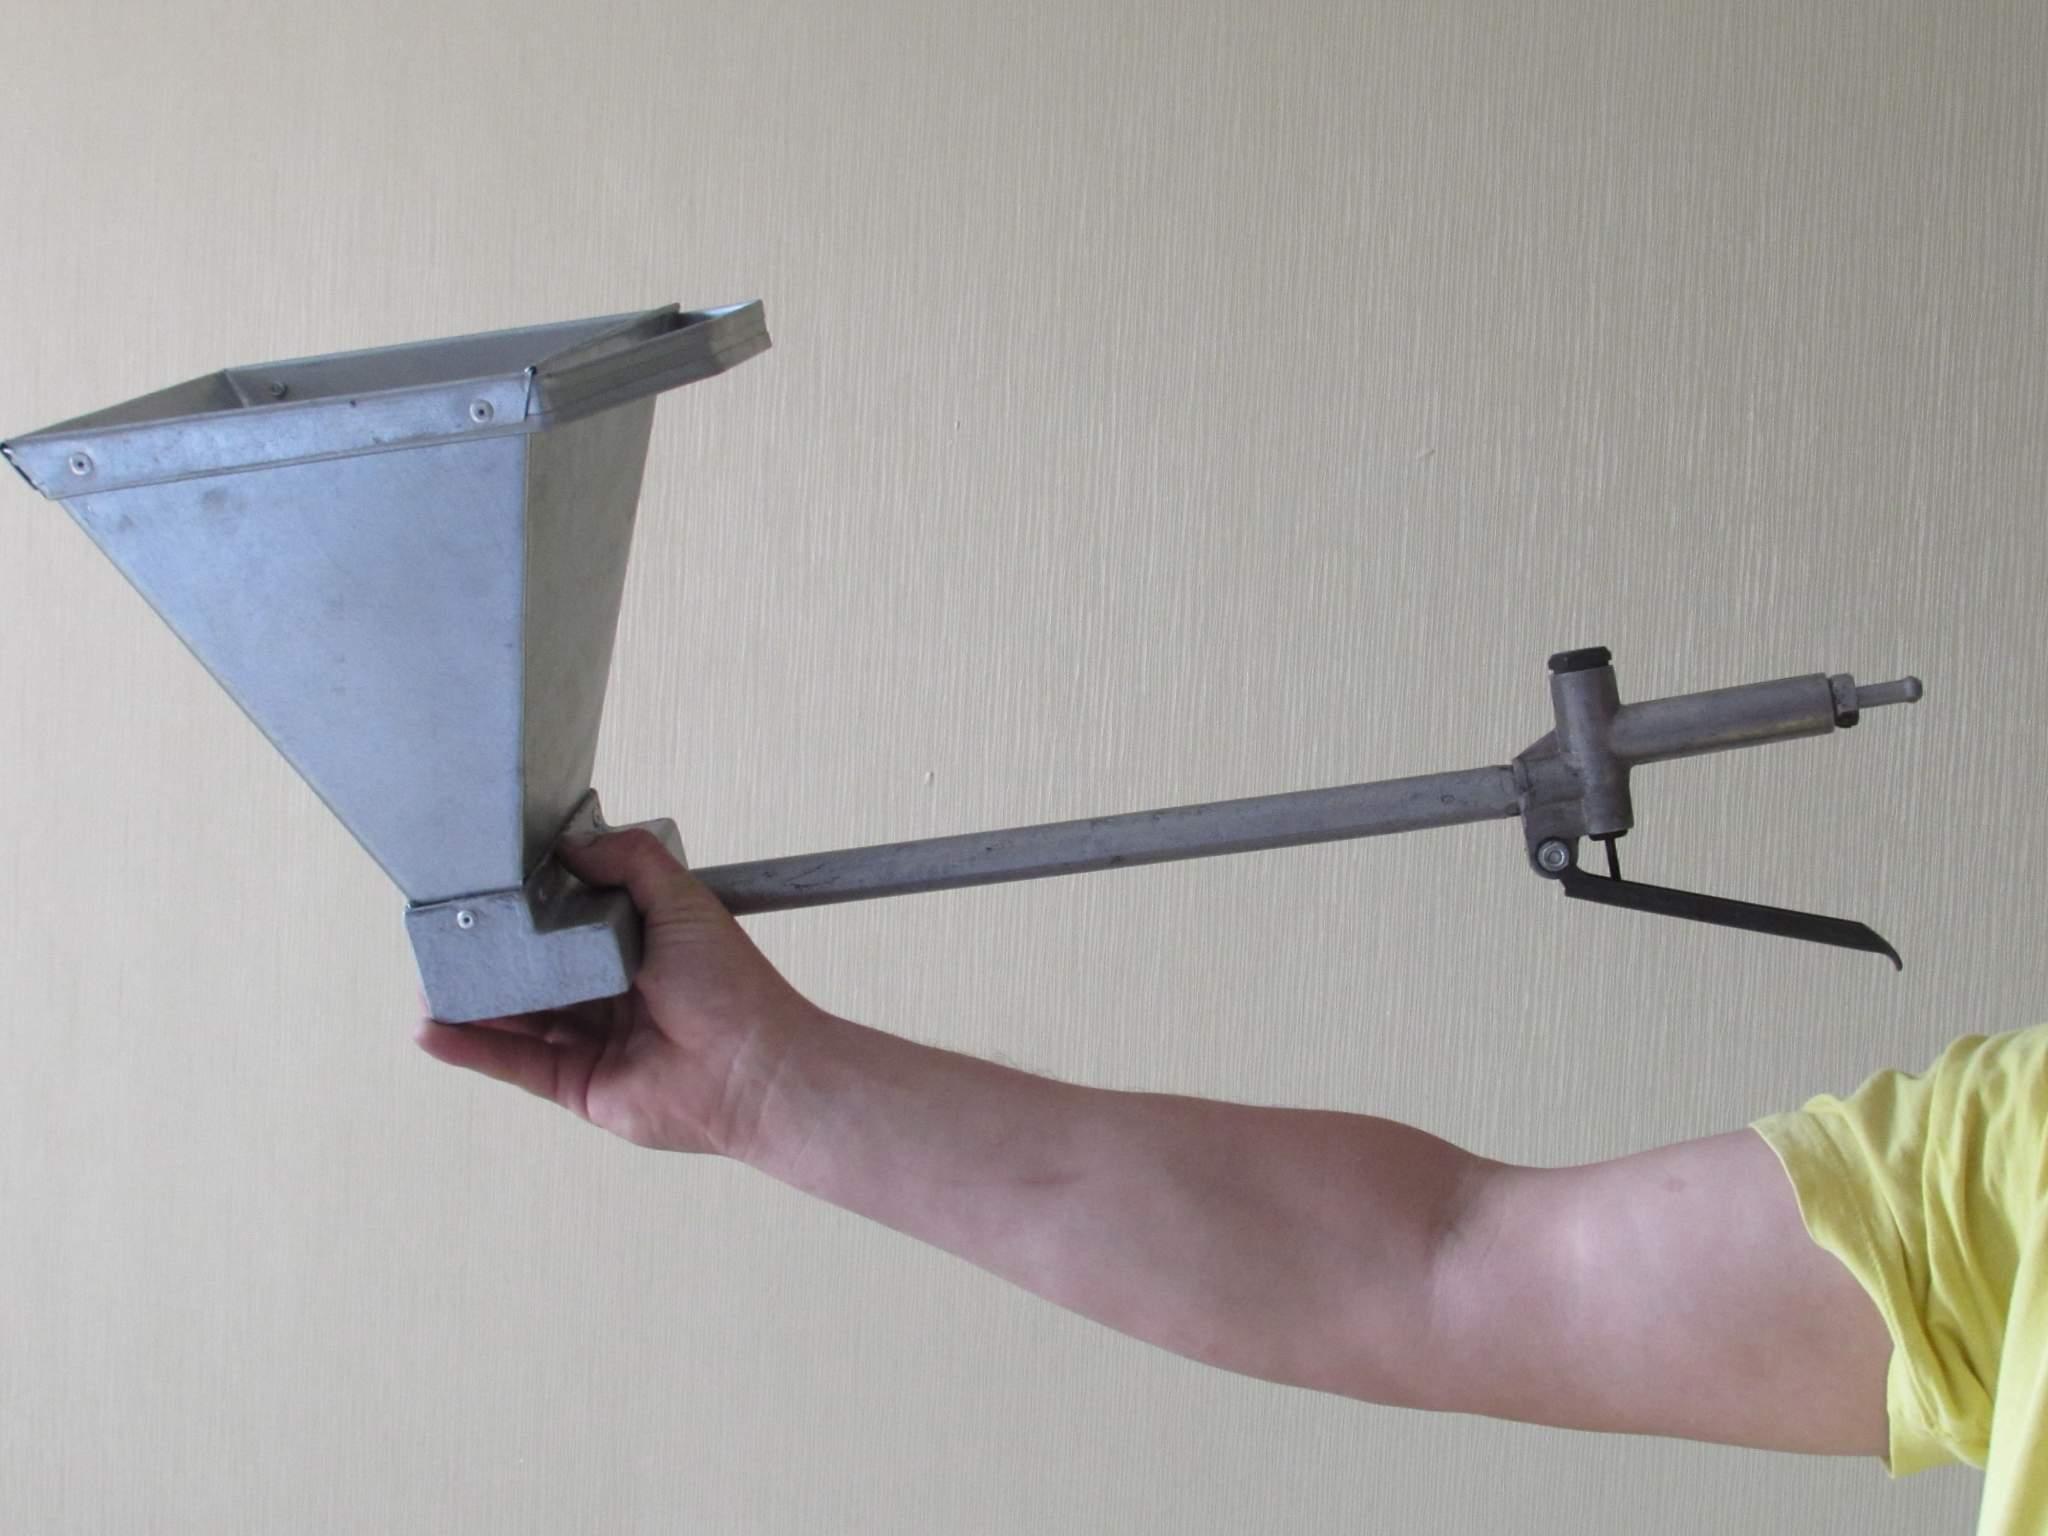 Фото картушного пистолета в руке